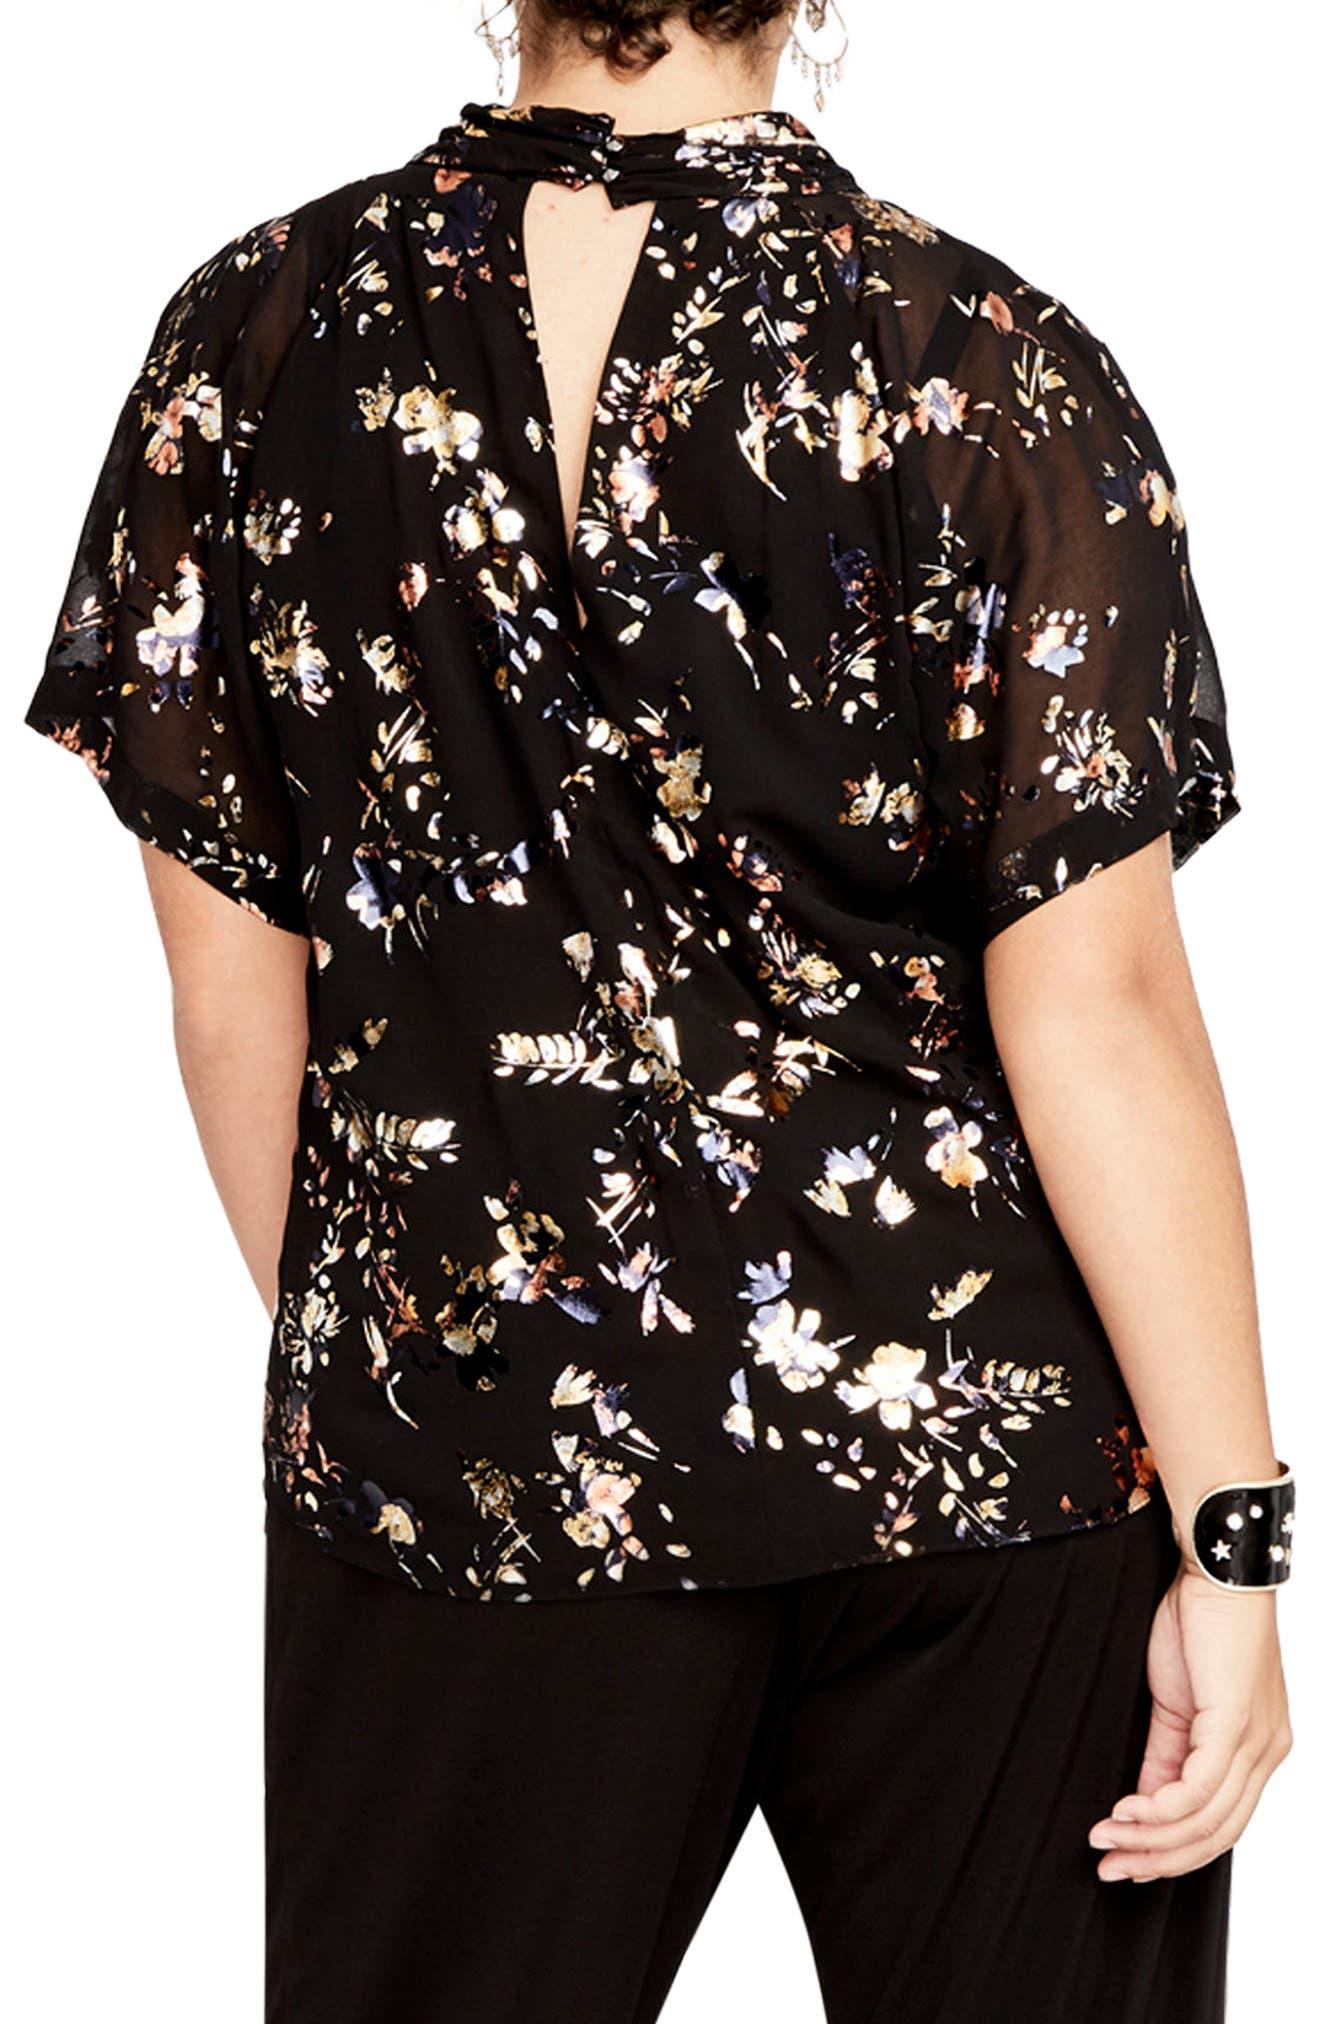 Foiled Print Kimono Top,                             Alternate thumbnail 2, color,